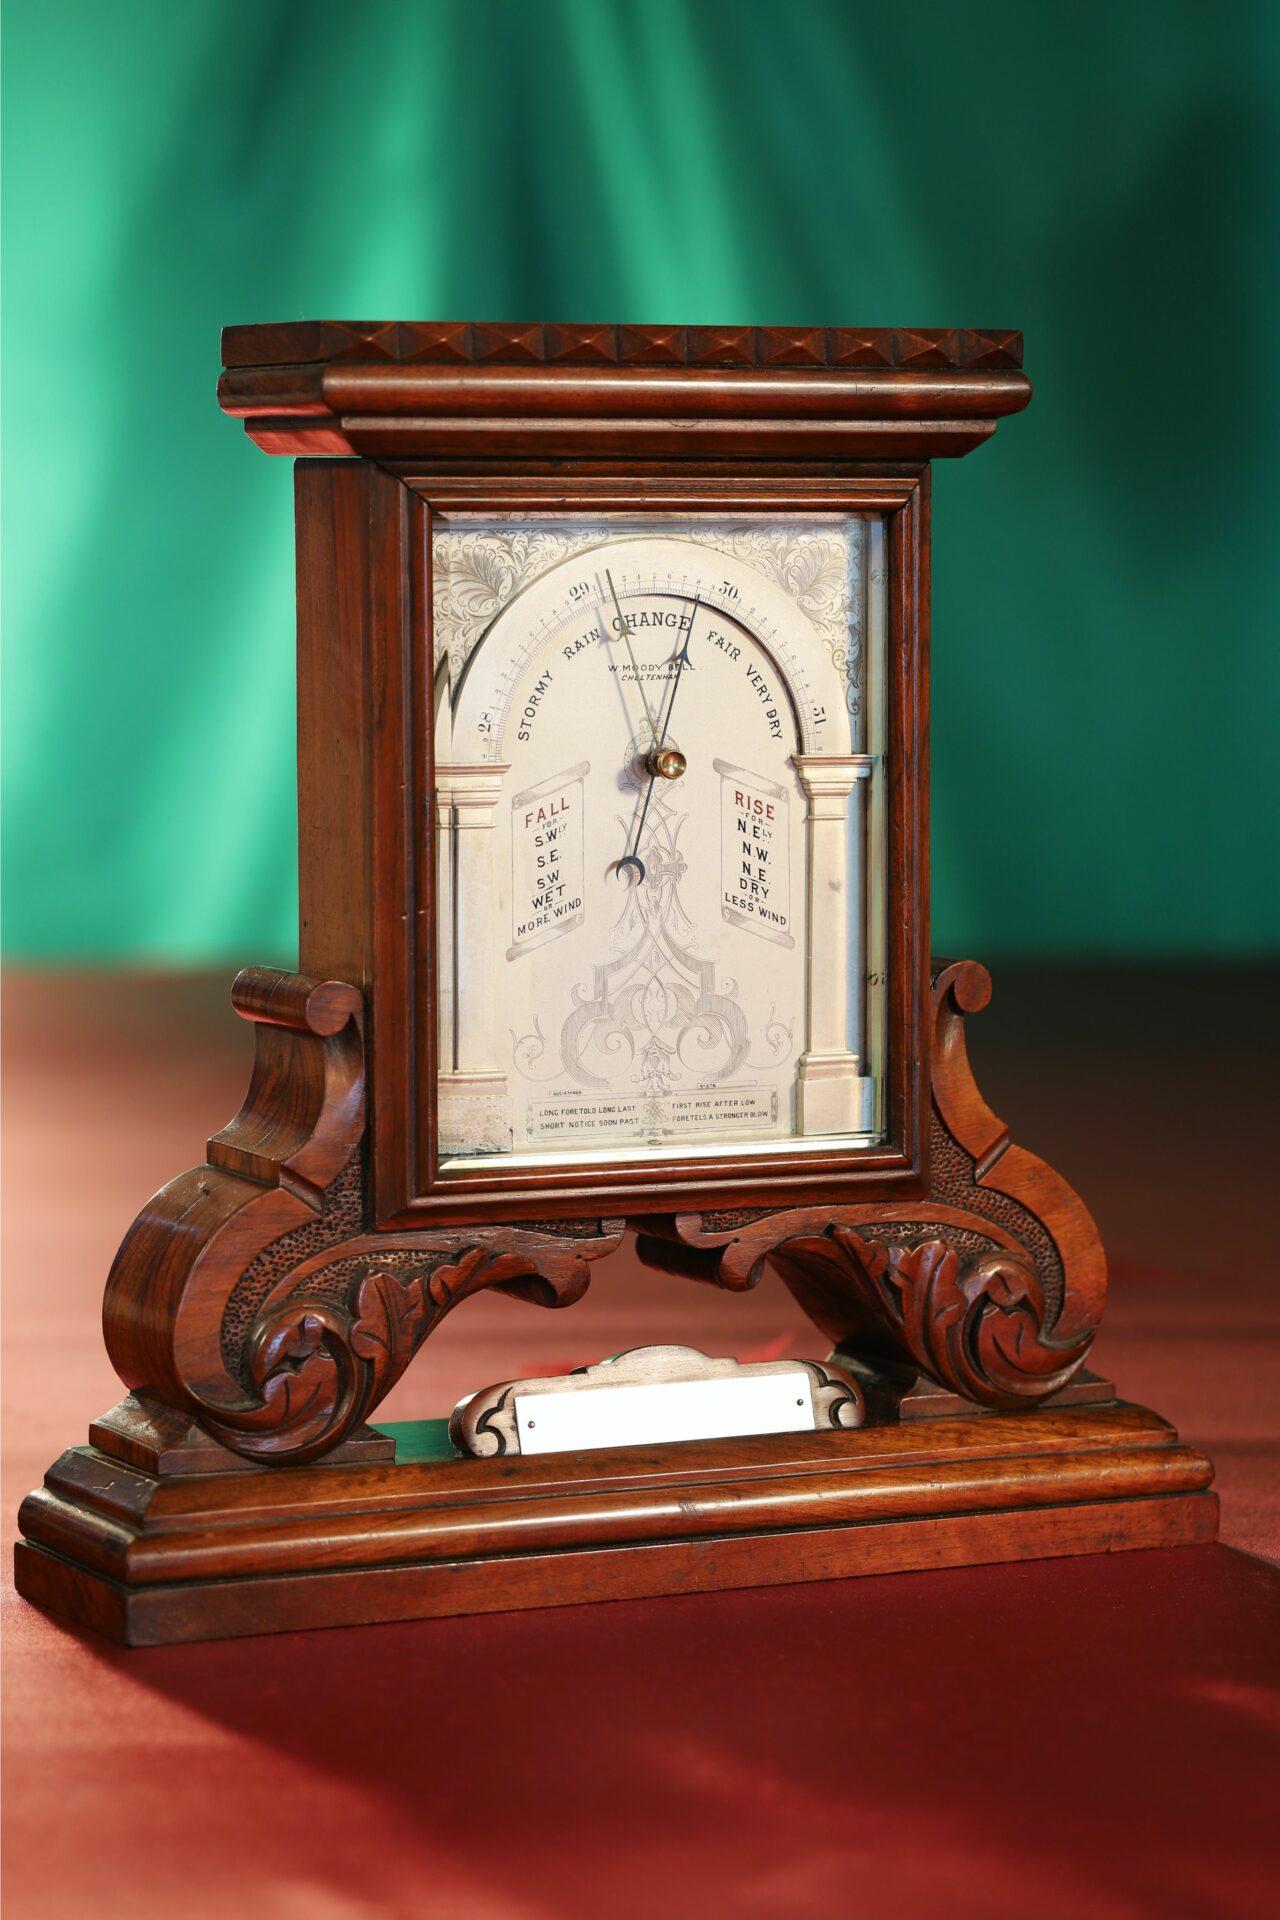 Image of Moody Bell Table Barometer c1880 taken from lefthandside